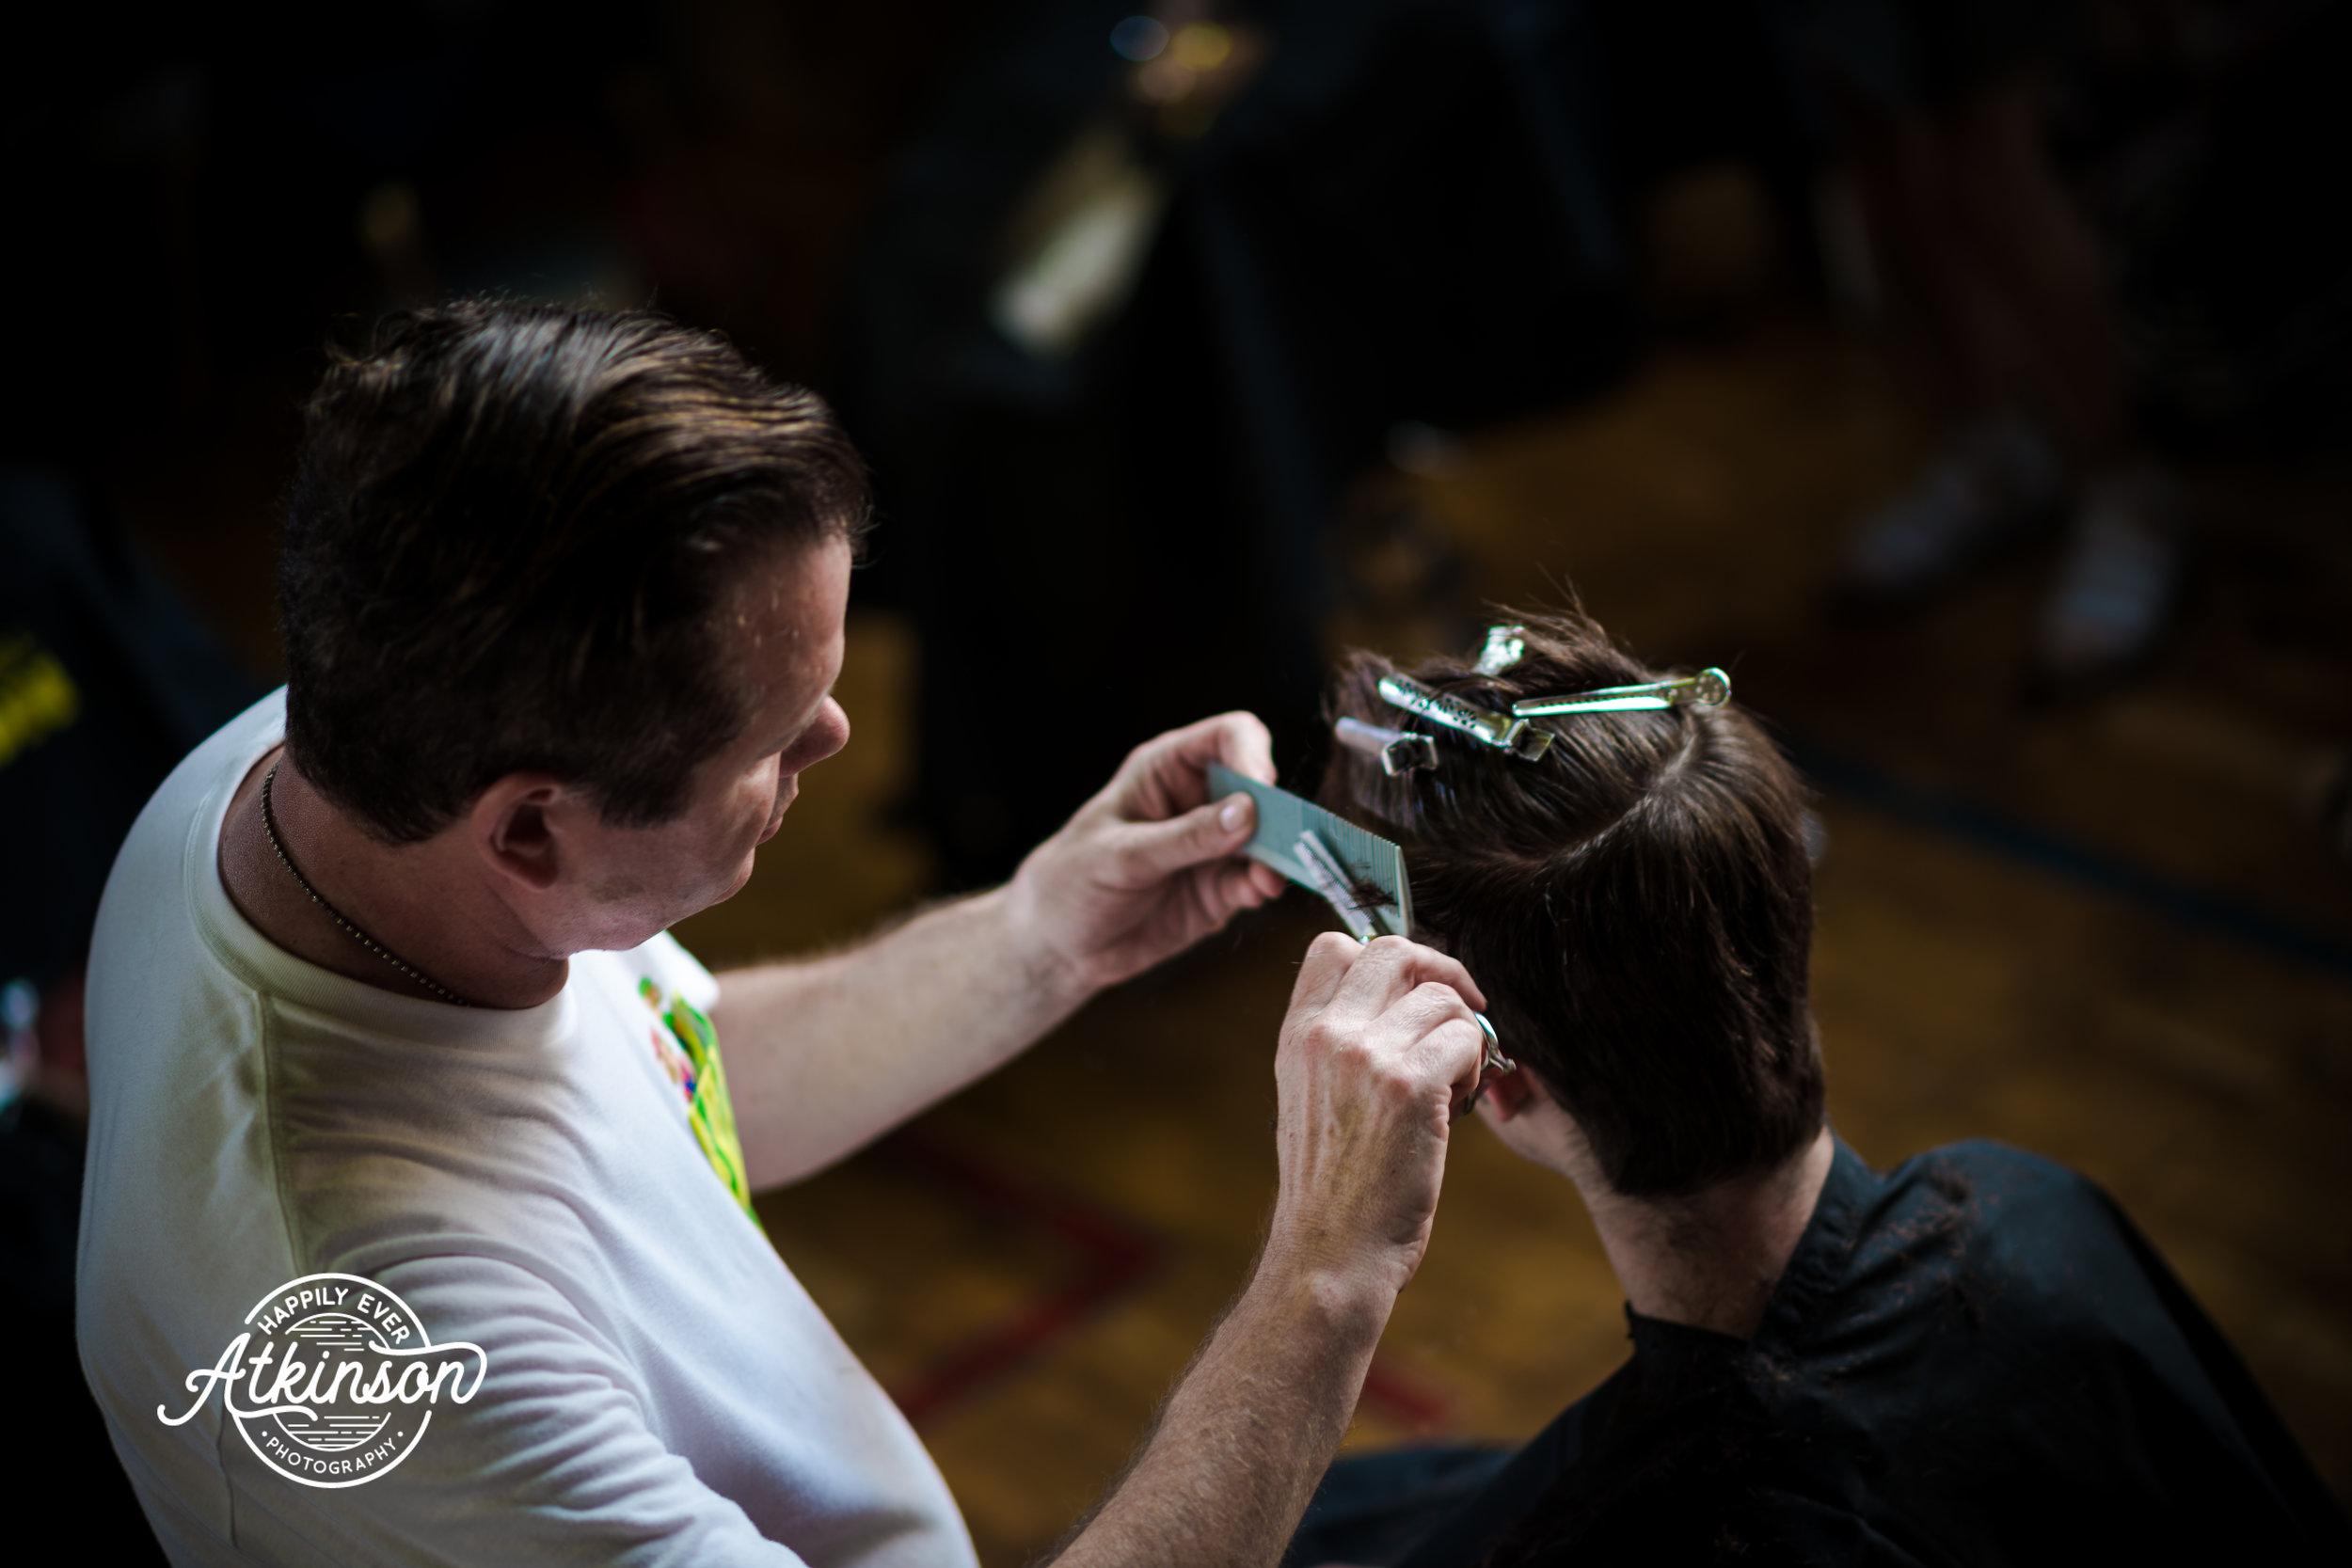 Gentleman cuts hair